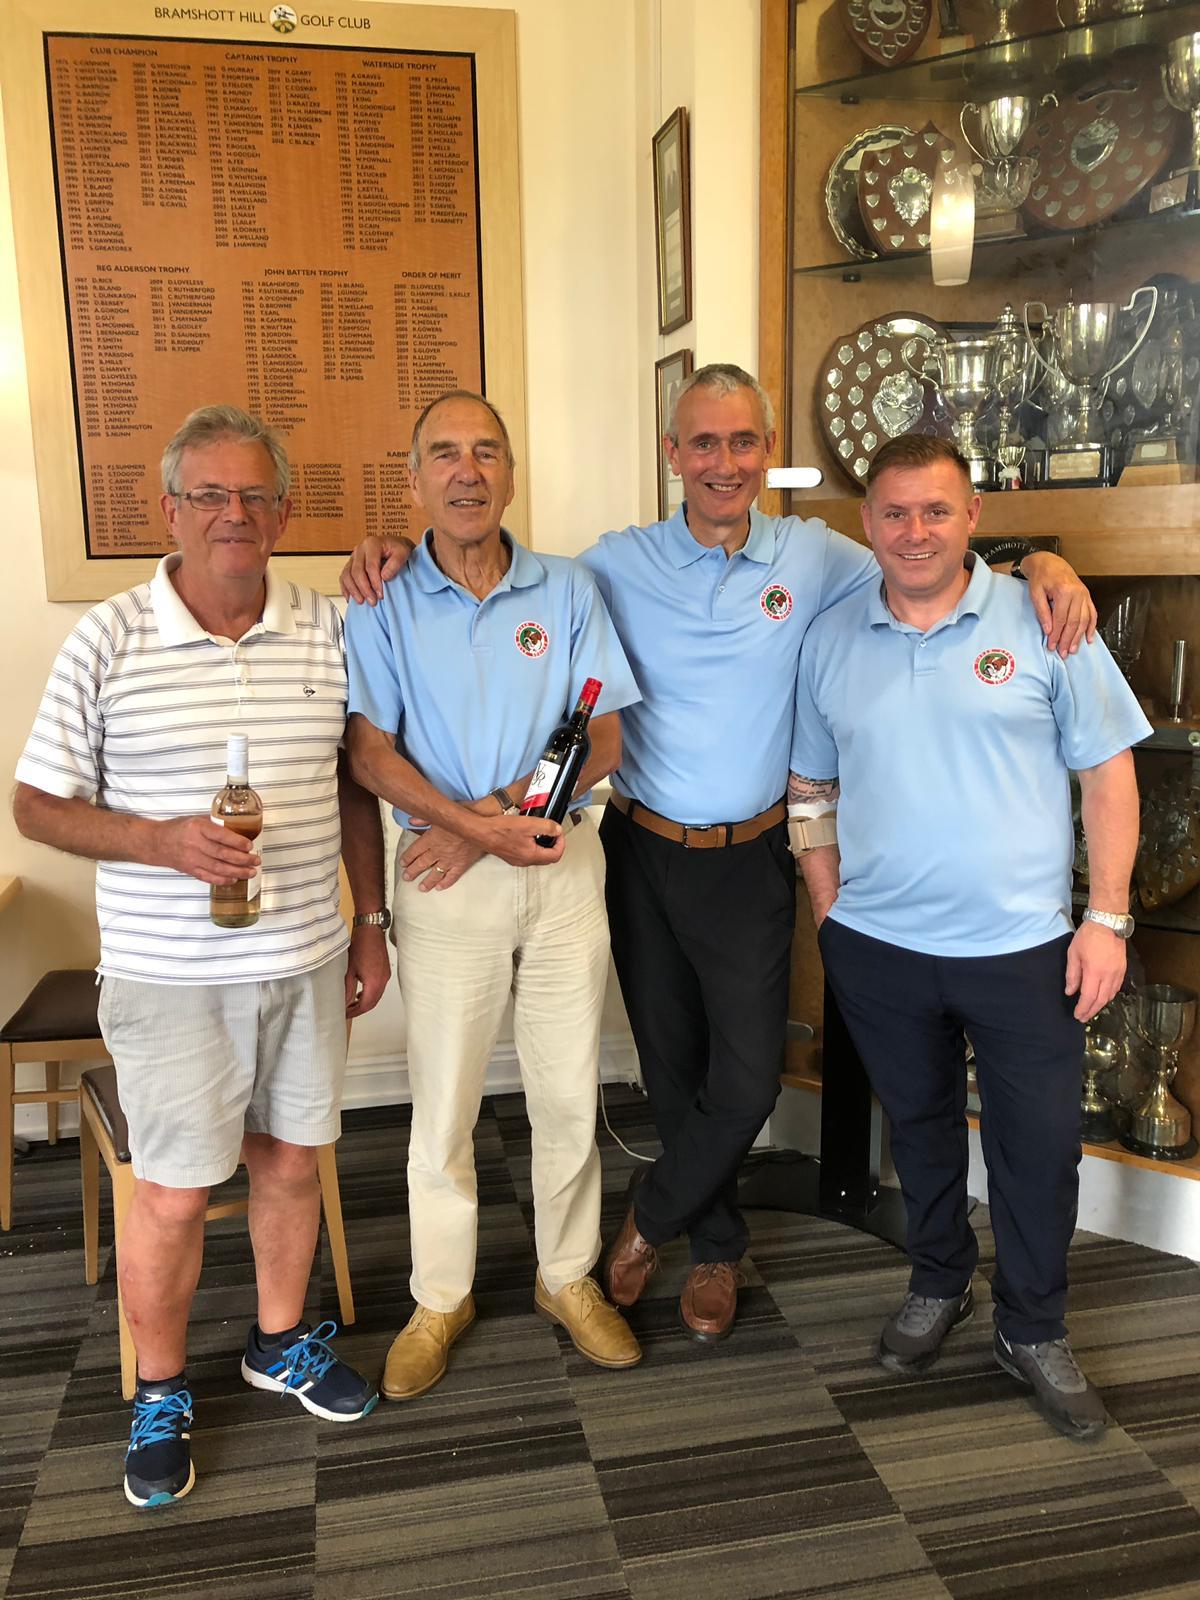 25 June 2019: L to R:- M Cook- J Poore wine winners / 2s Comp- P Barnett- Paul Mortimer